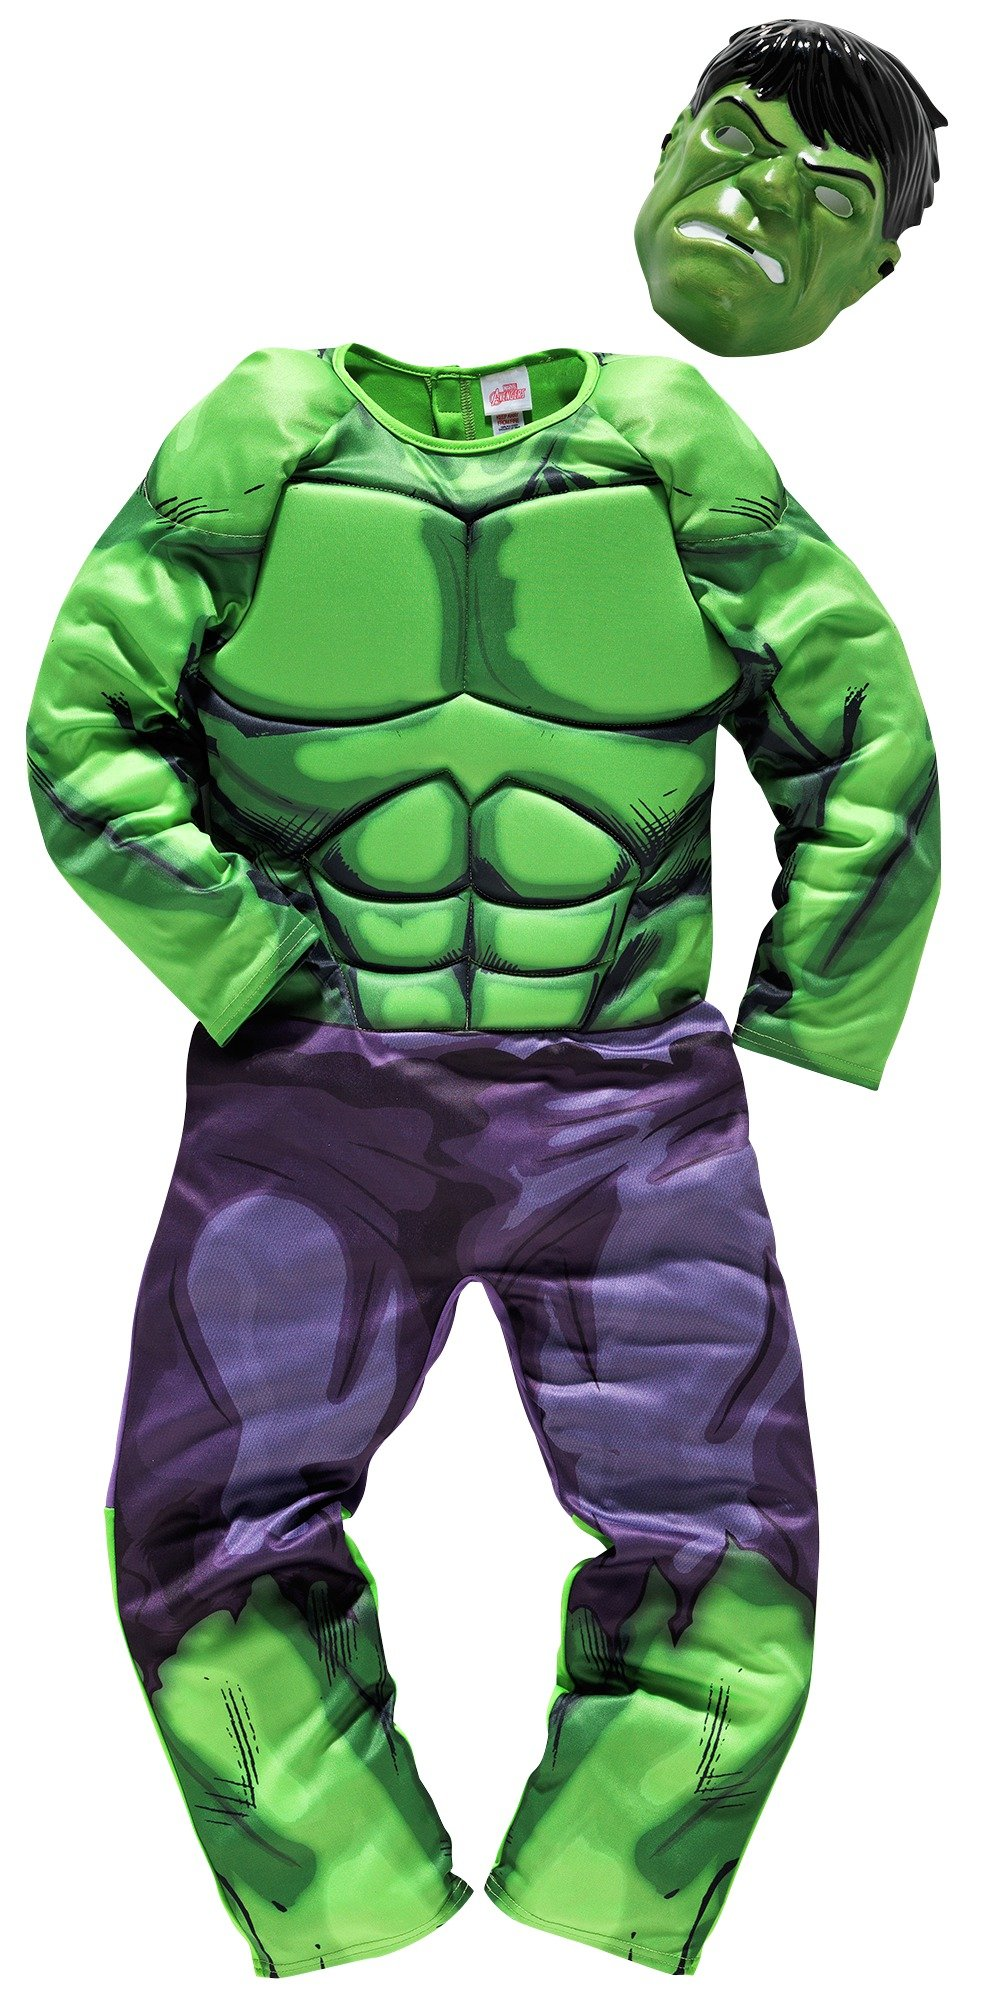 Marvel Hulk Children's Fancy Dress Costume - 5-6 Years